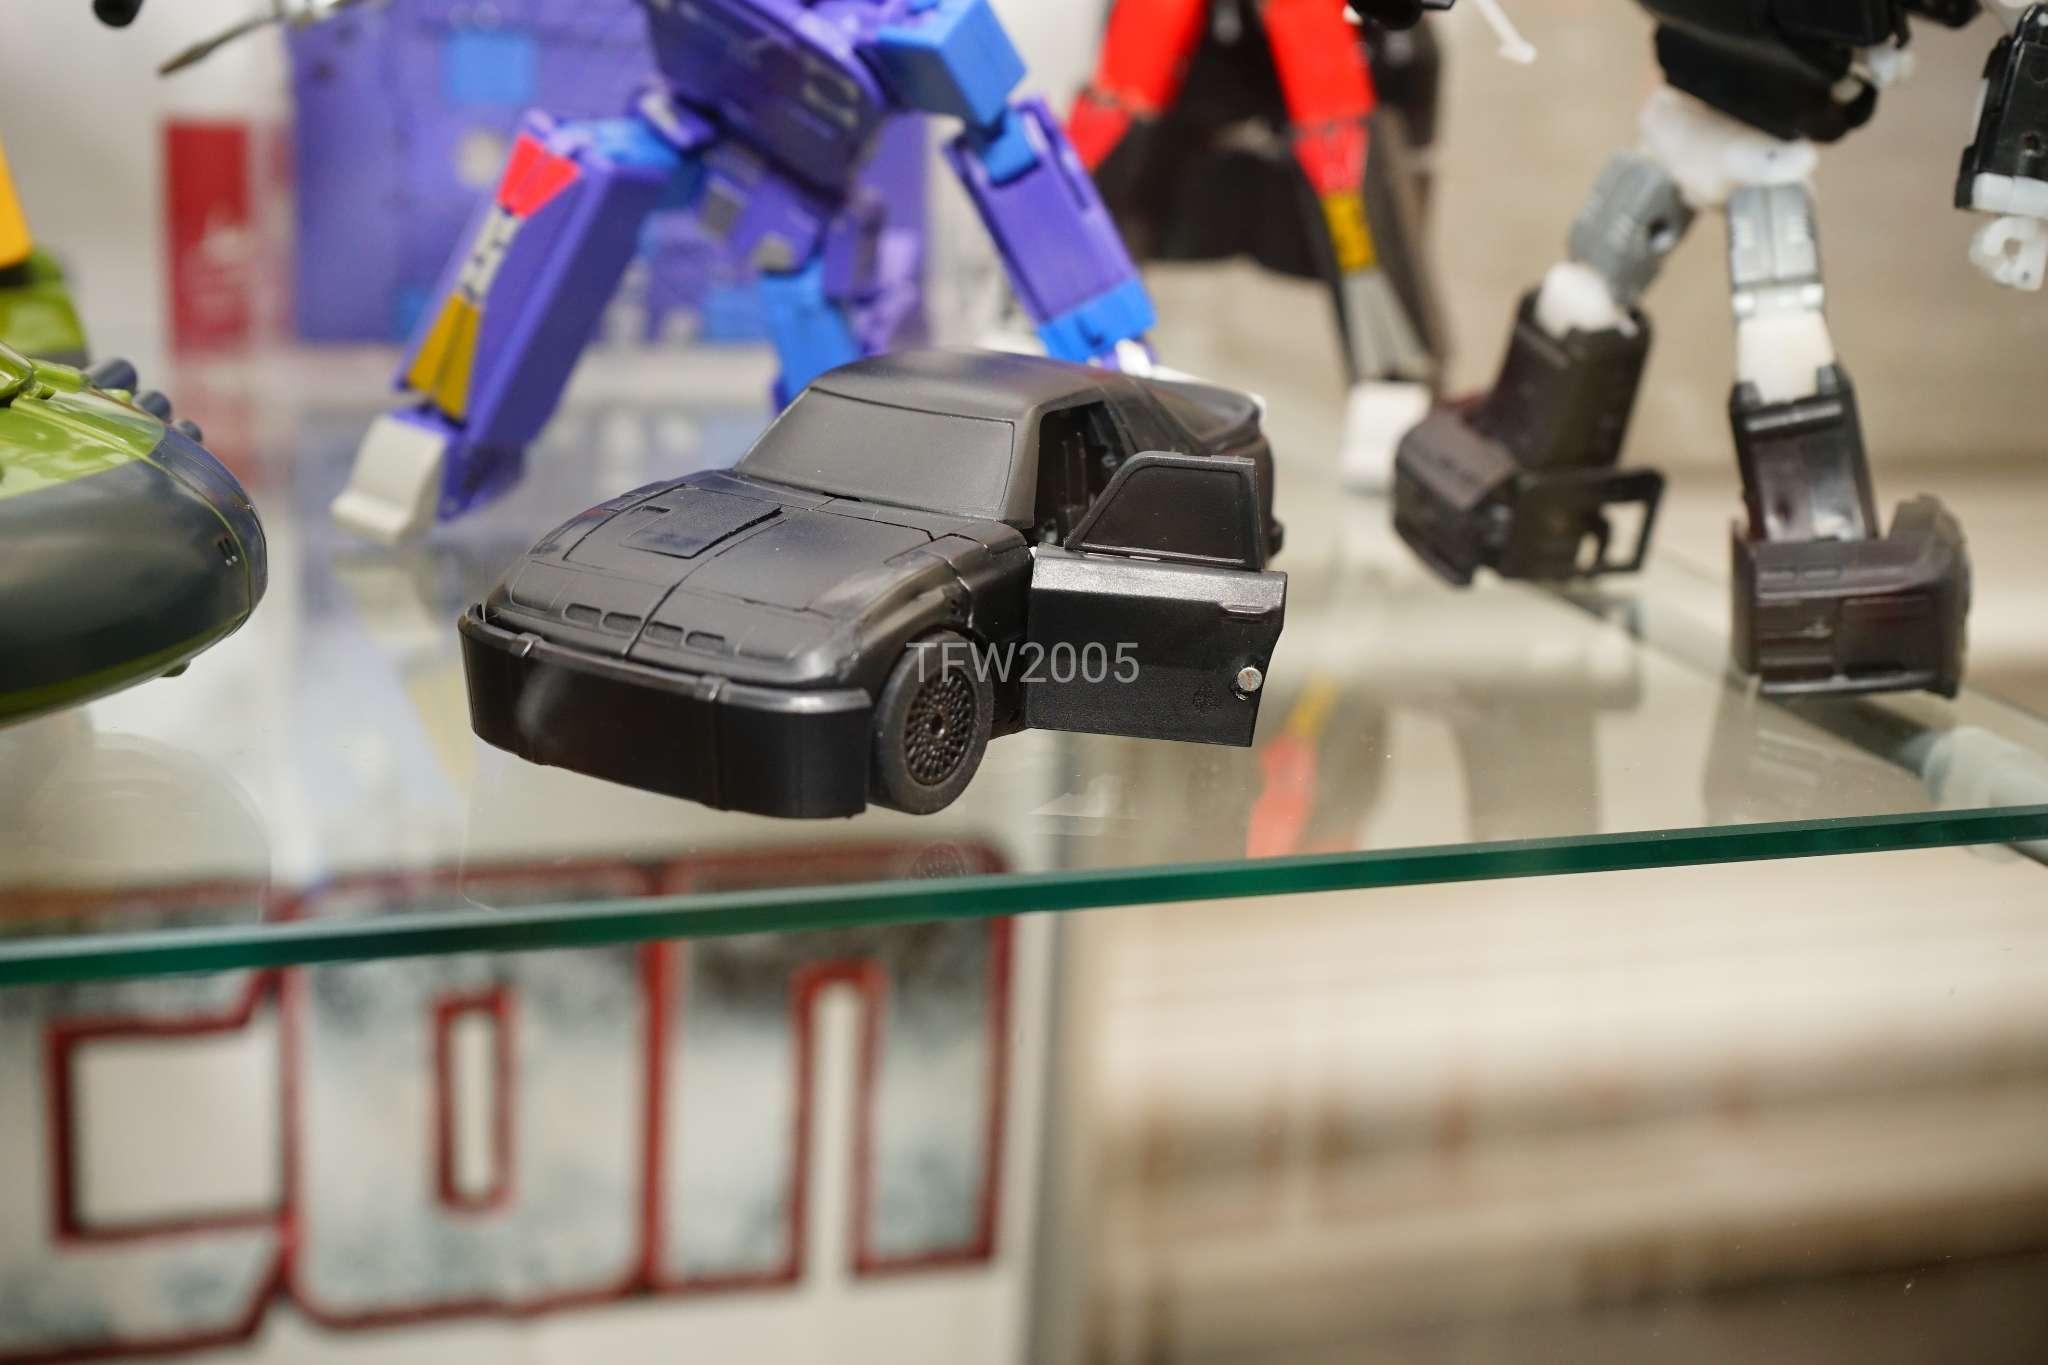 [Ocular Max] Produit Tiers - Minibots MP - PS-09 Hellion (aka Cliffjumper/Matamore), PS-11 Omne - (aka Cosmos) HjM2K8Js_o